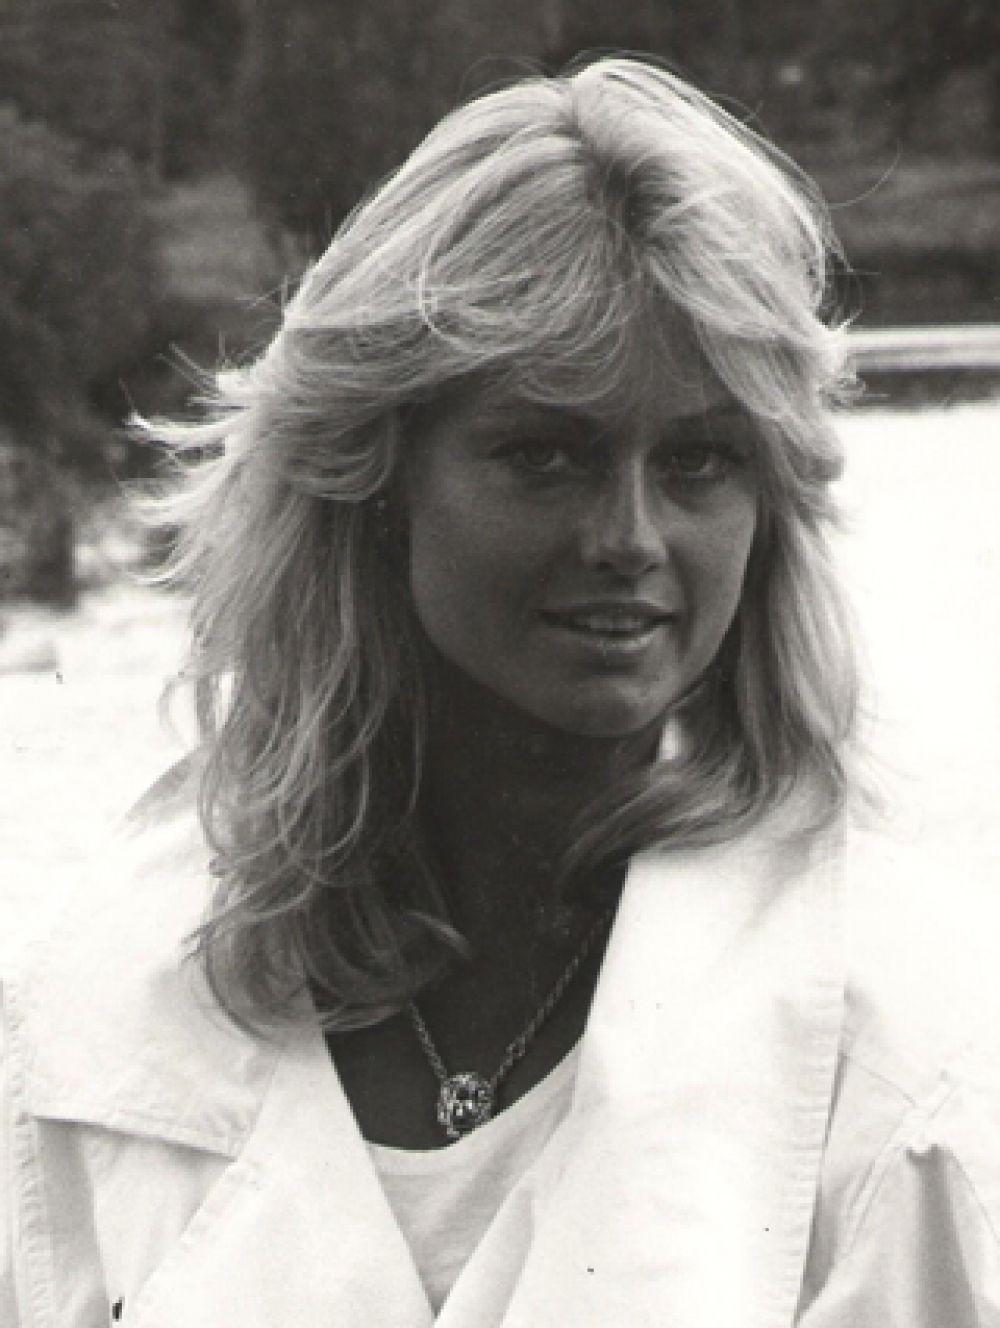 «Мисс Мира 1977» Мари Стэвин, Швеция